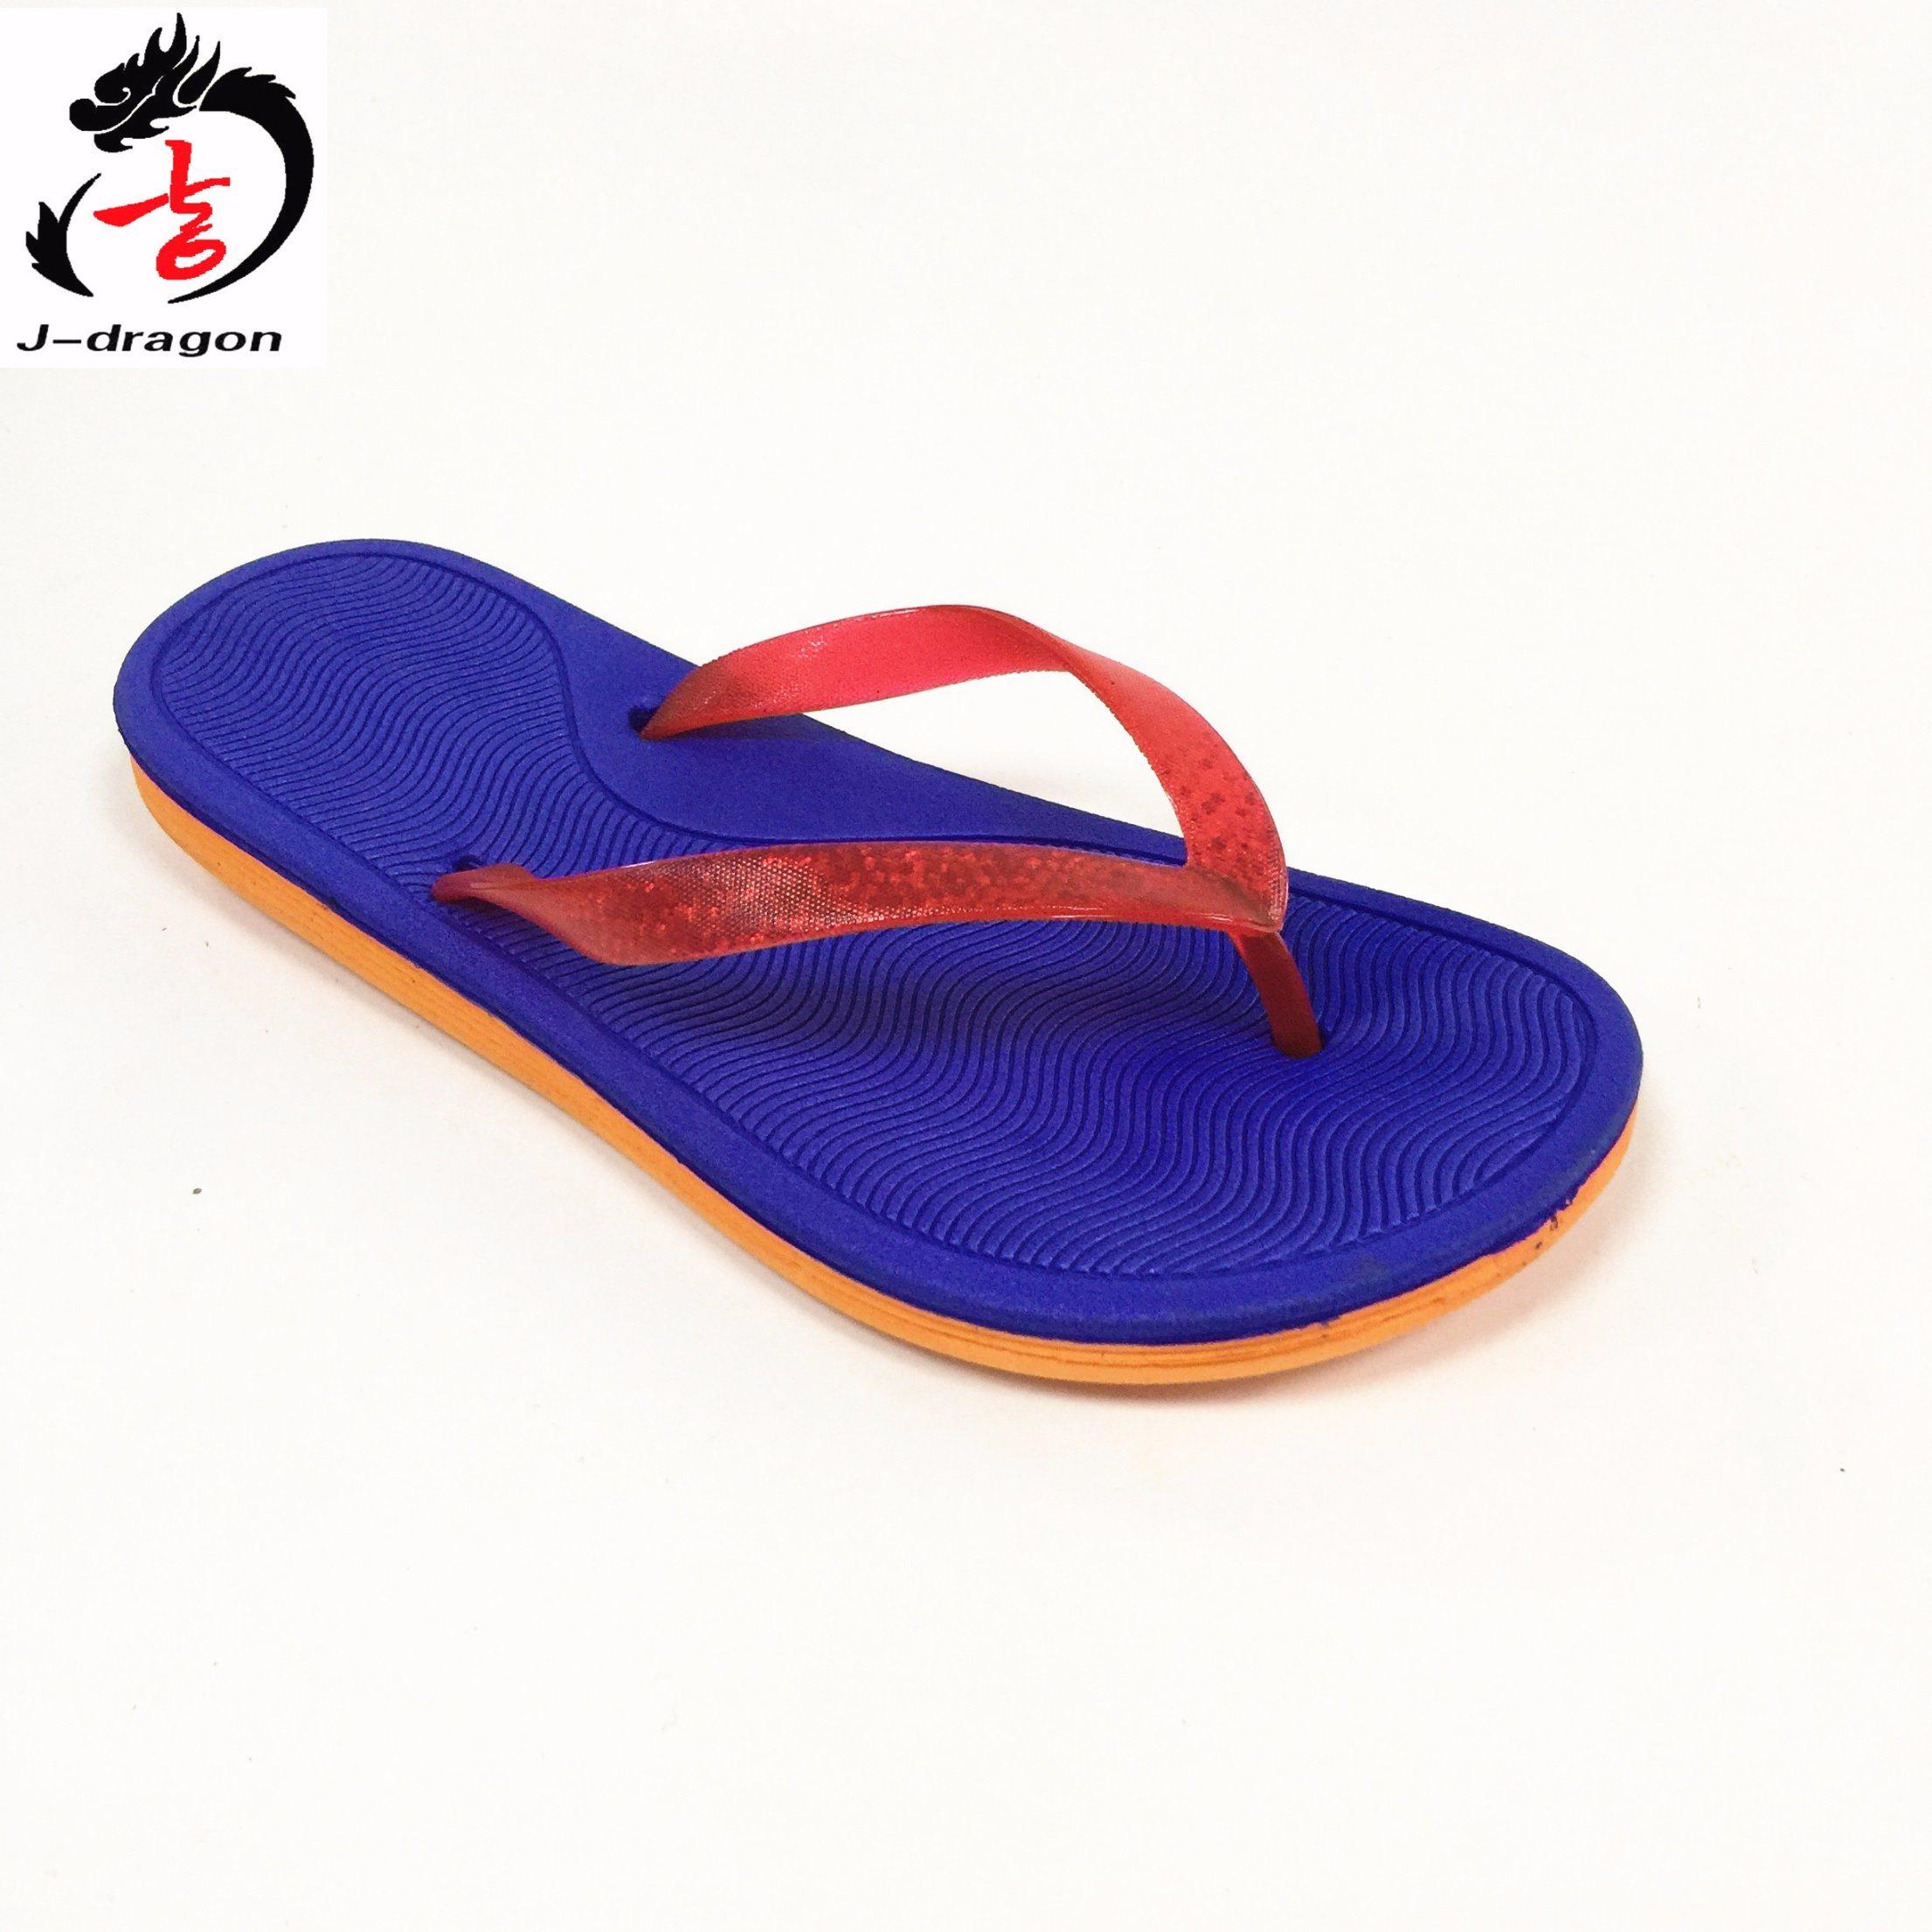 MD coloridas sandalias para hombres